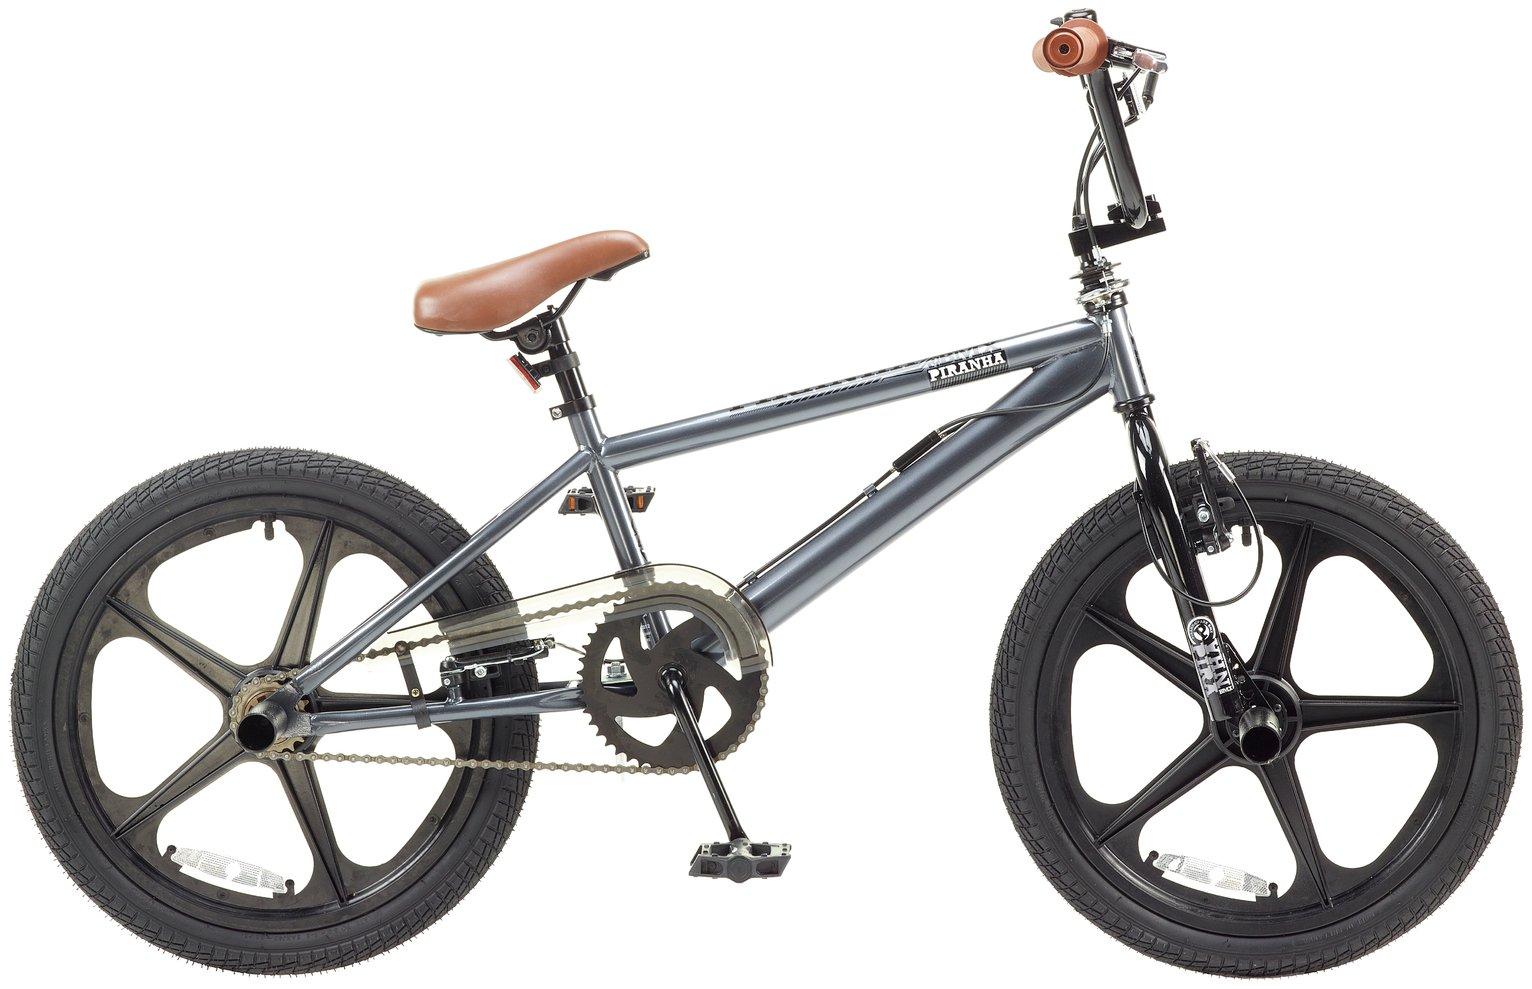 'Piranha 20 Inch No Mercy Bmx Bike